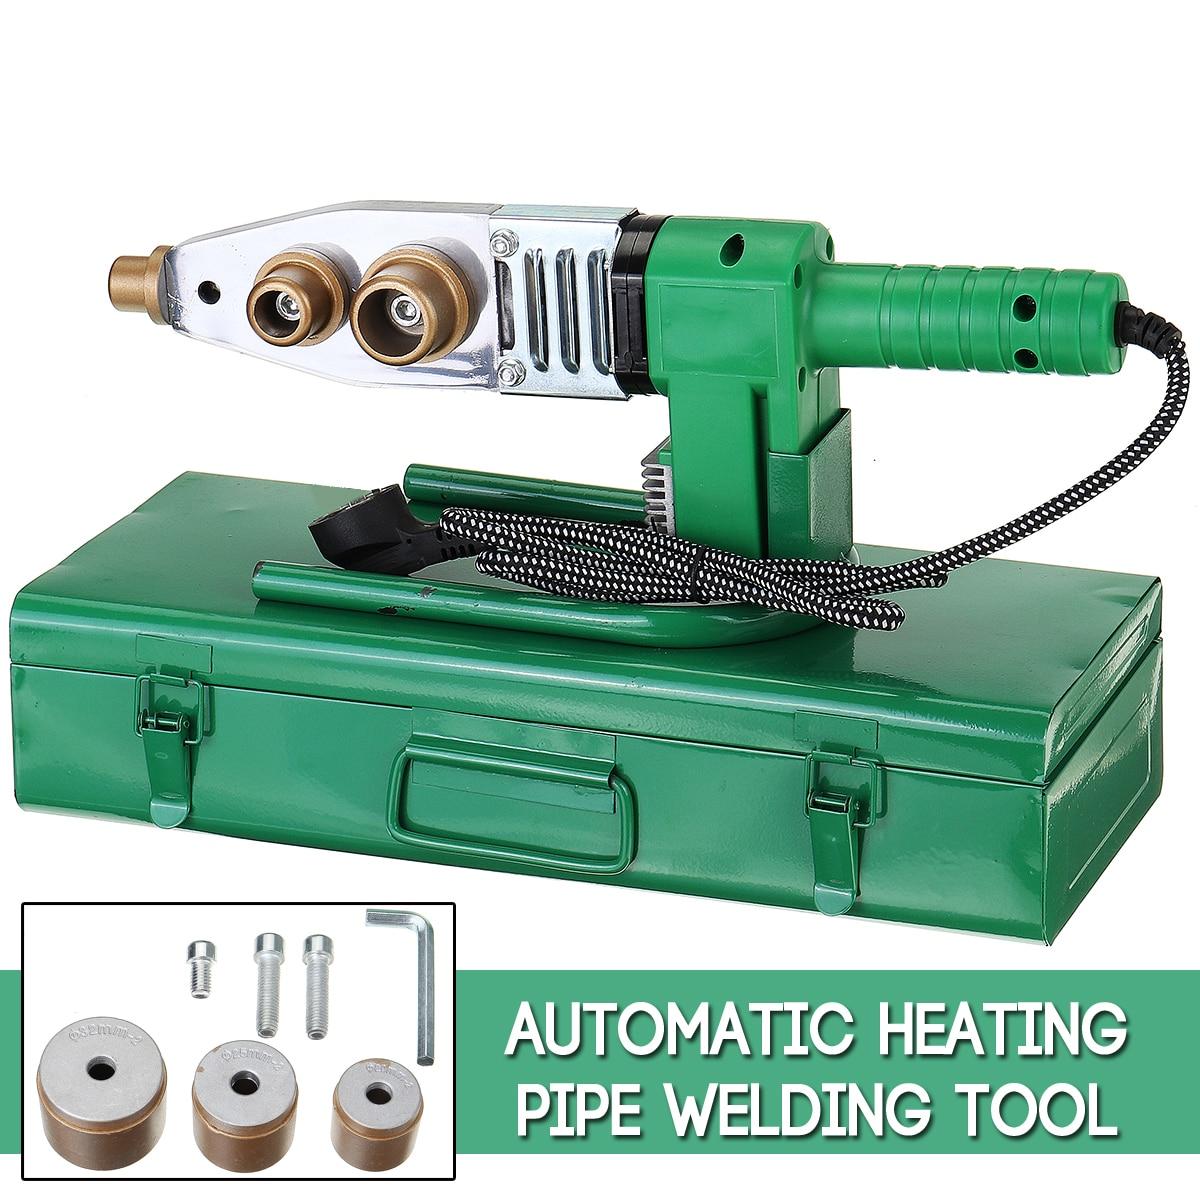 Electric Pipe Welding Machine Heating Tool Heads Set For PPR PB PE Plastic Tube PPR Welder Hot Melt Machine Temperature Control